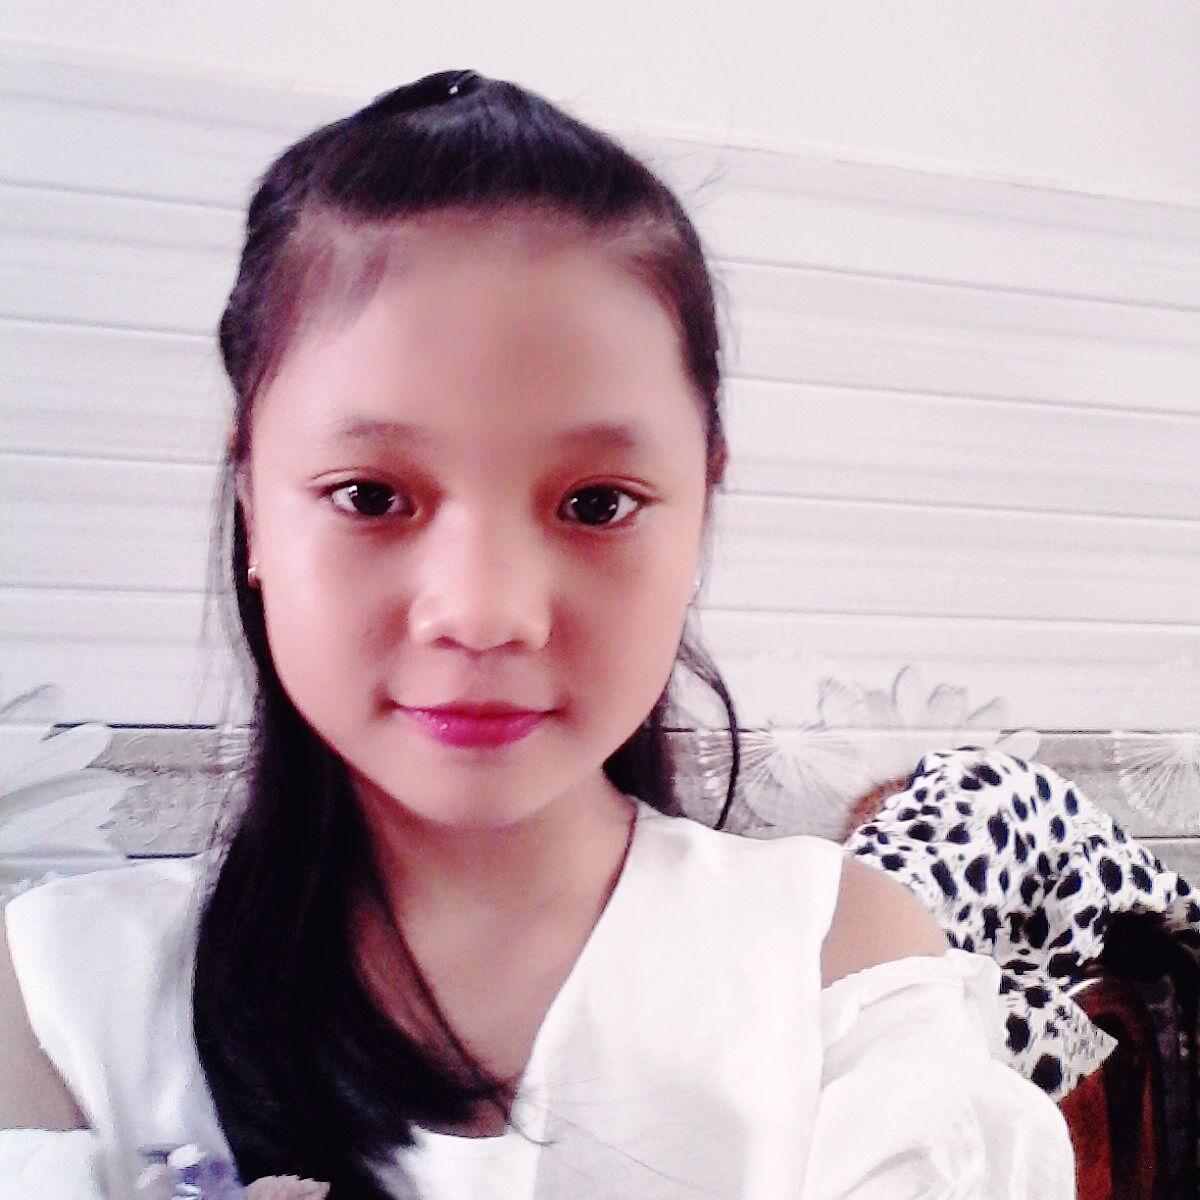 Dương Bảo Thy